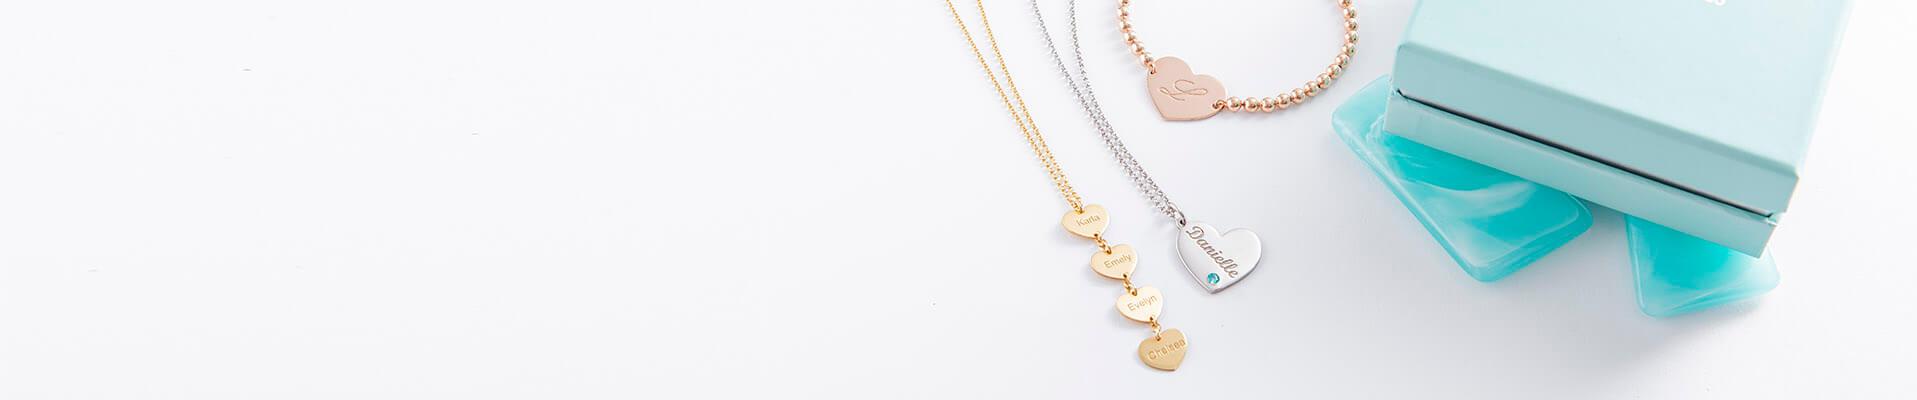 heart jewelry web banner